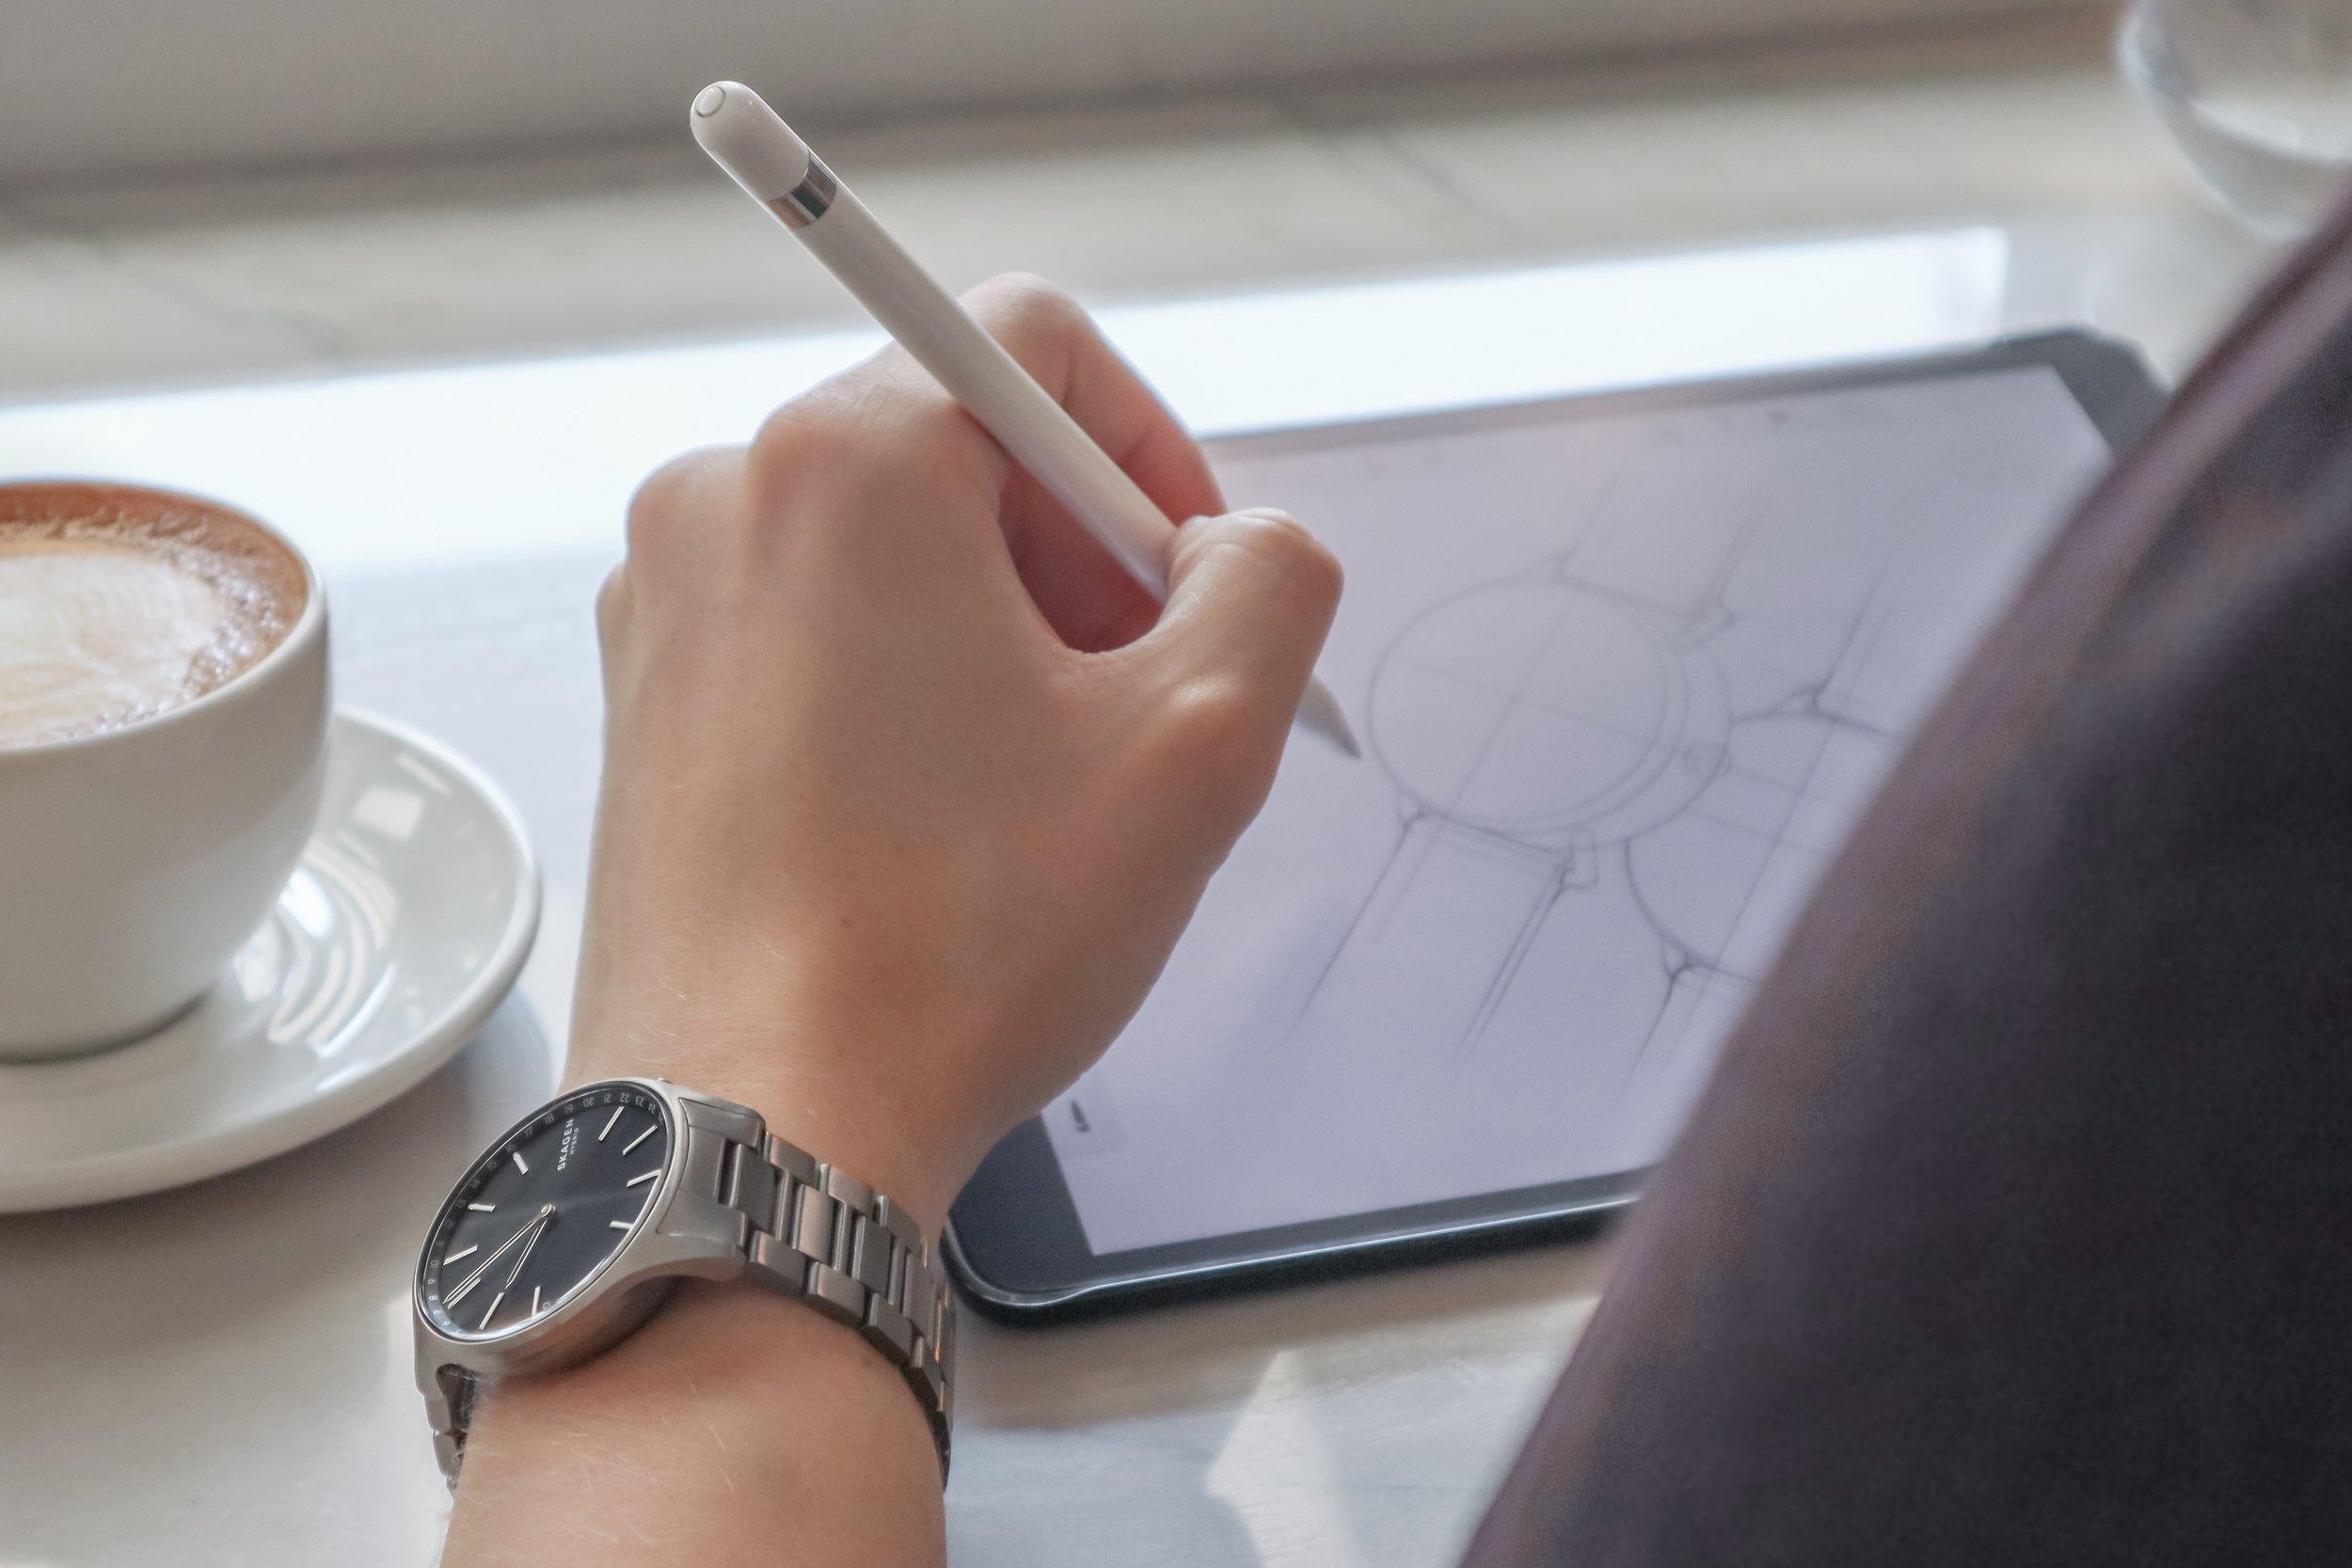 Skagen iPad Apple Pencil Watch Draw.JPG